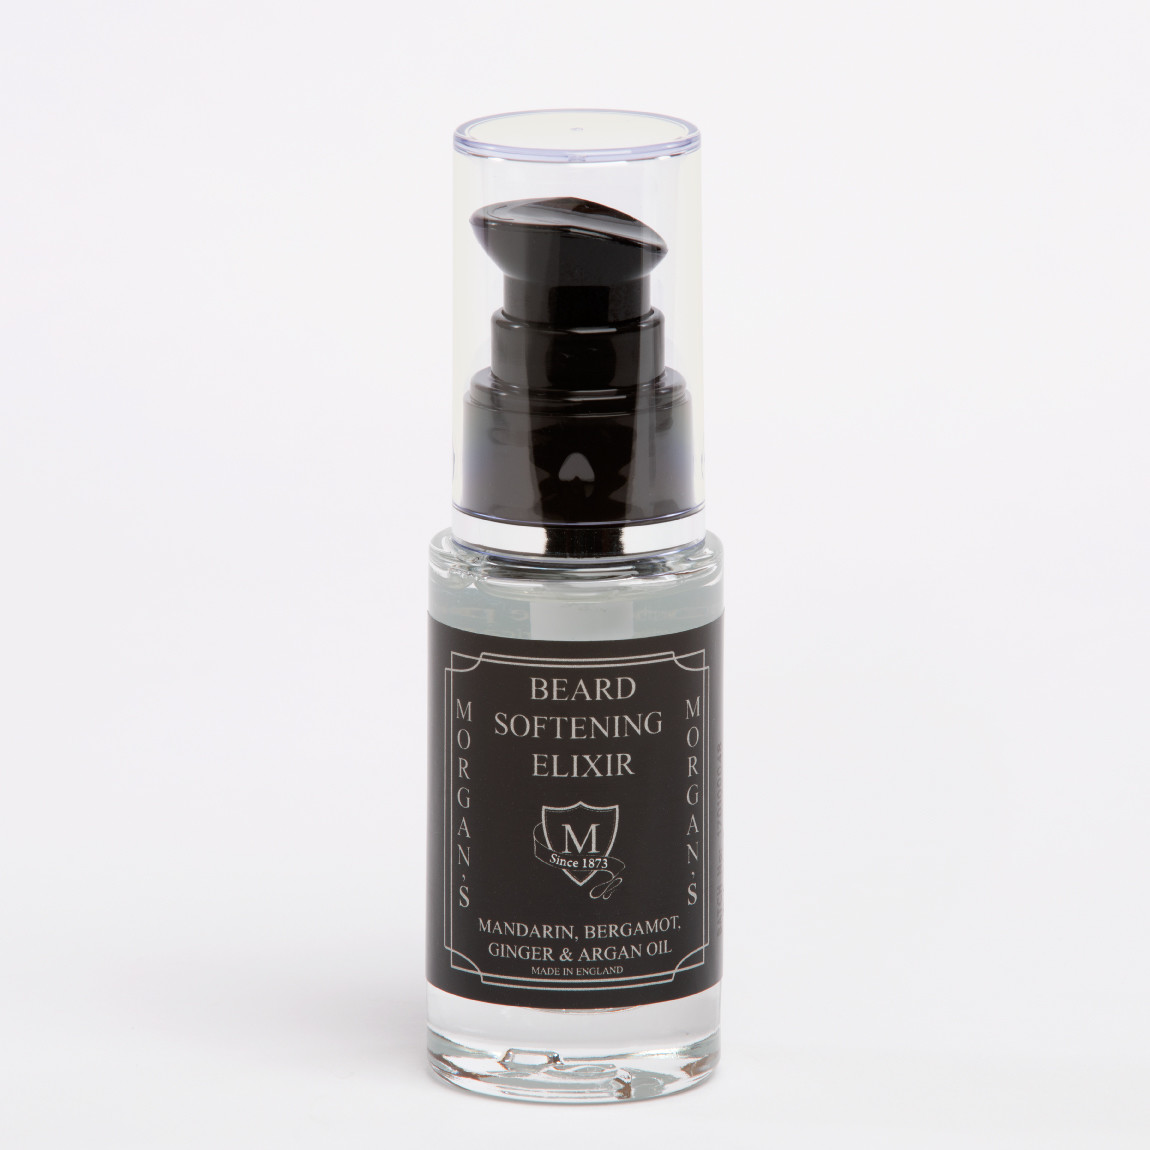 Beard Softening Elixir 30ml Glass Bottle